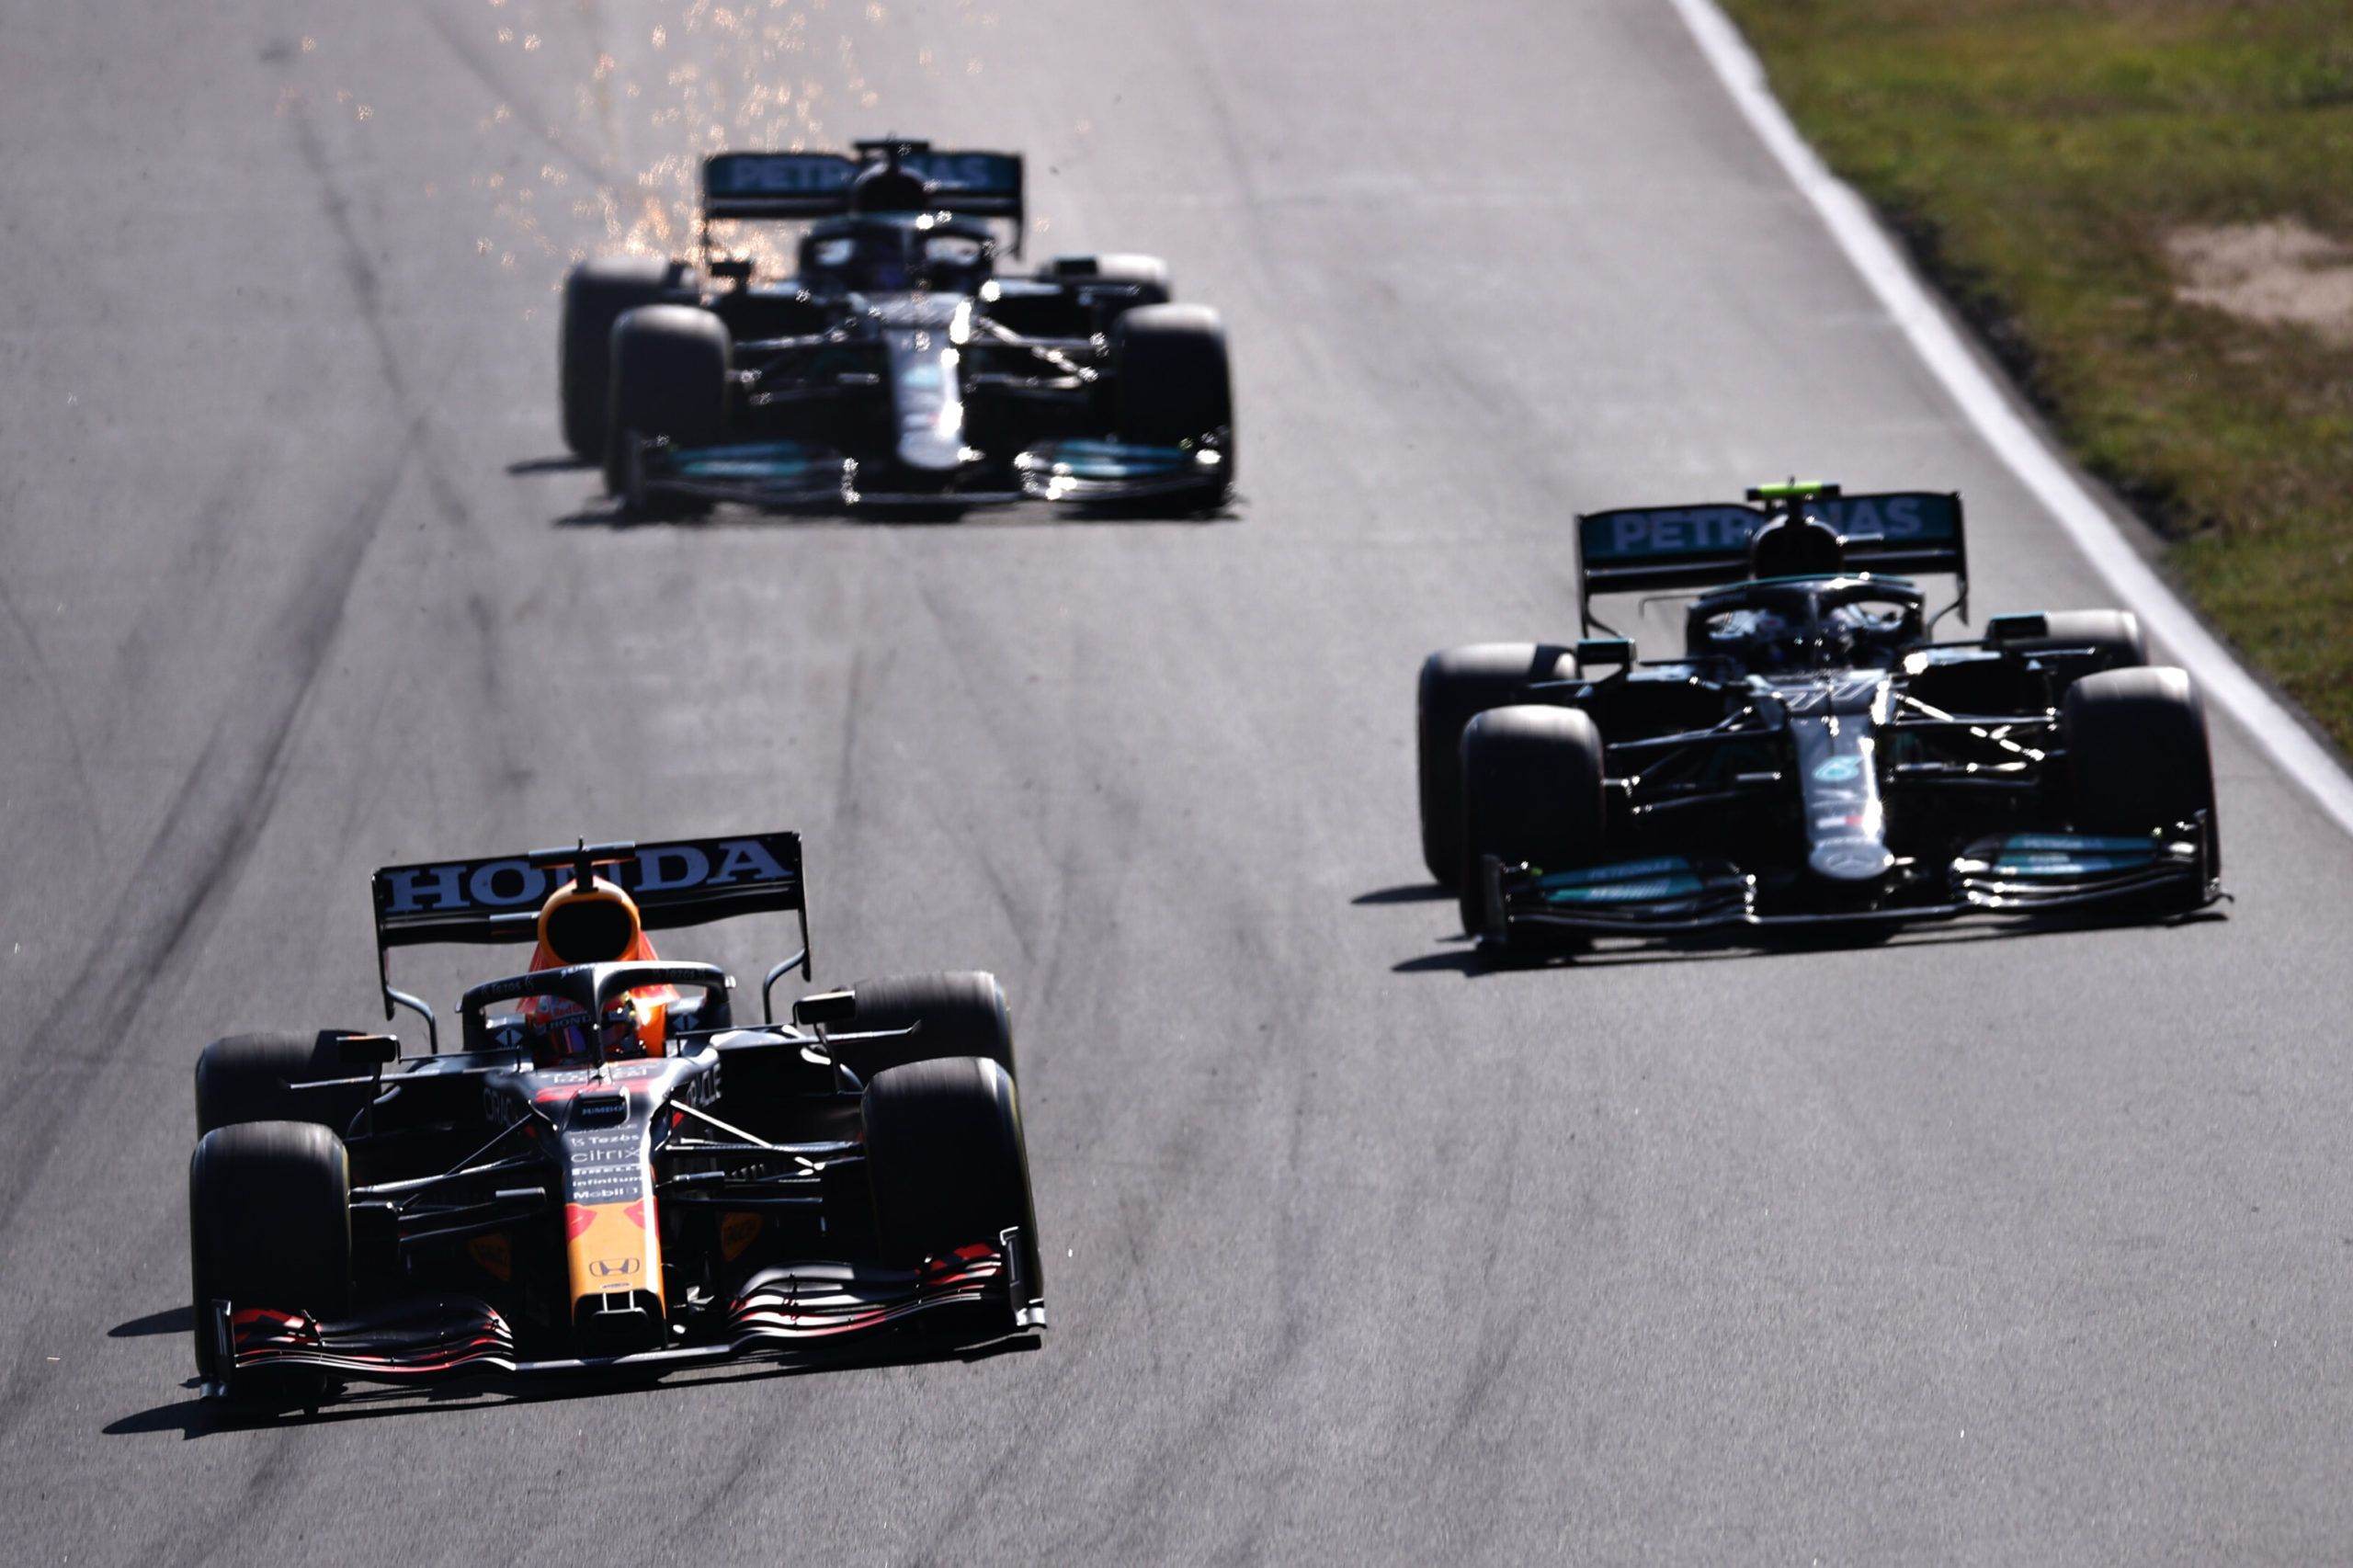 Toto Wolff, Mercedes, Red Bull, Lewis Hamilton, Max Verstappen